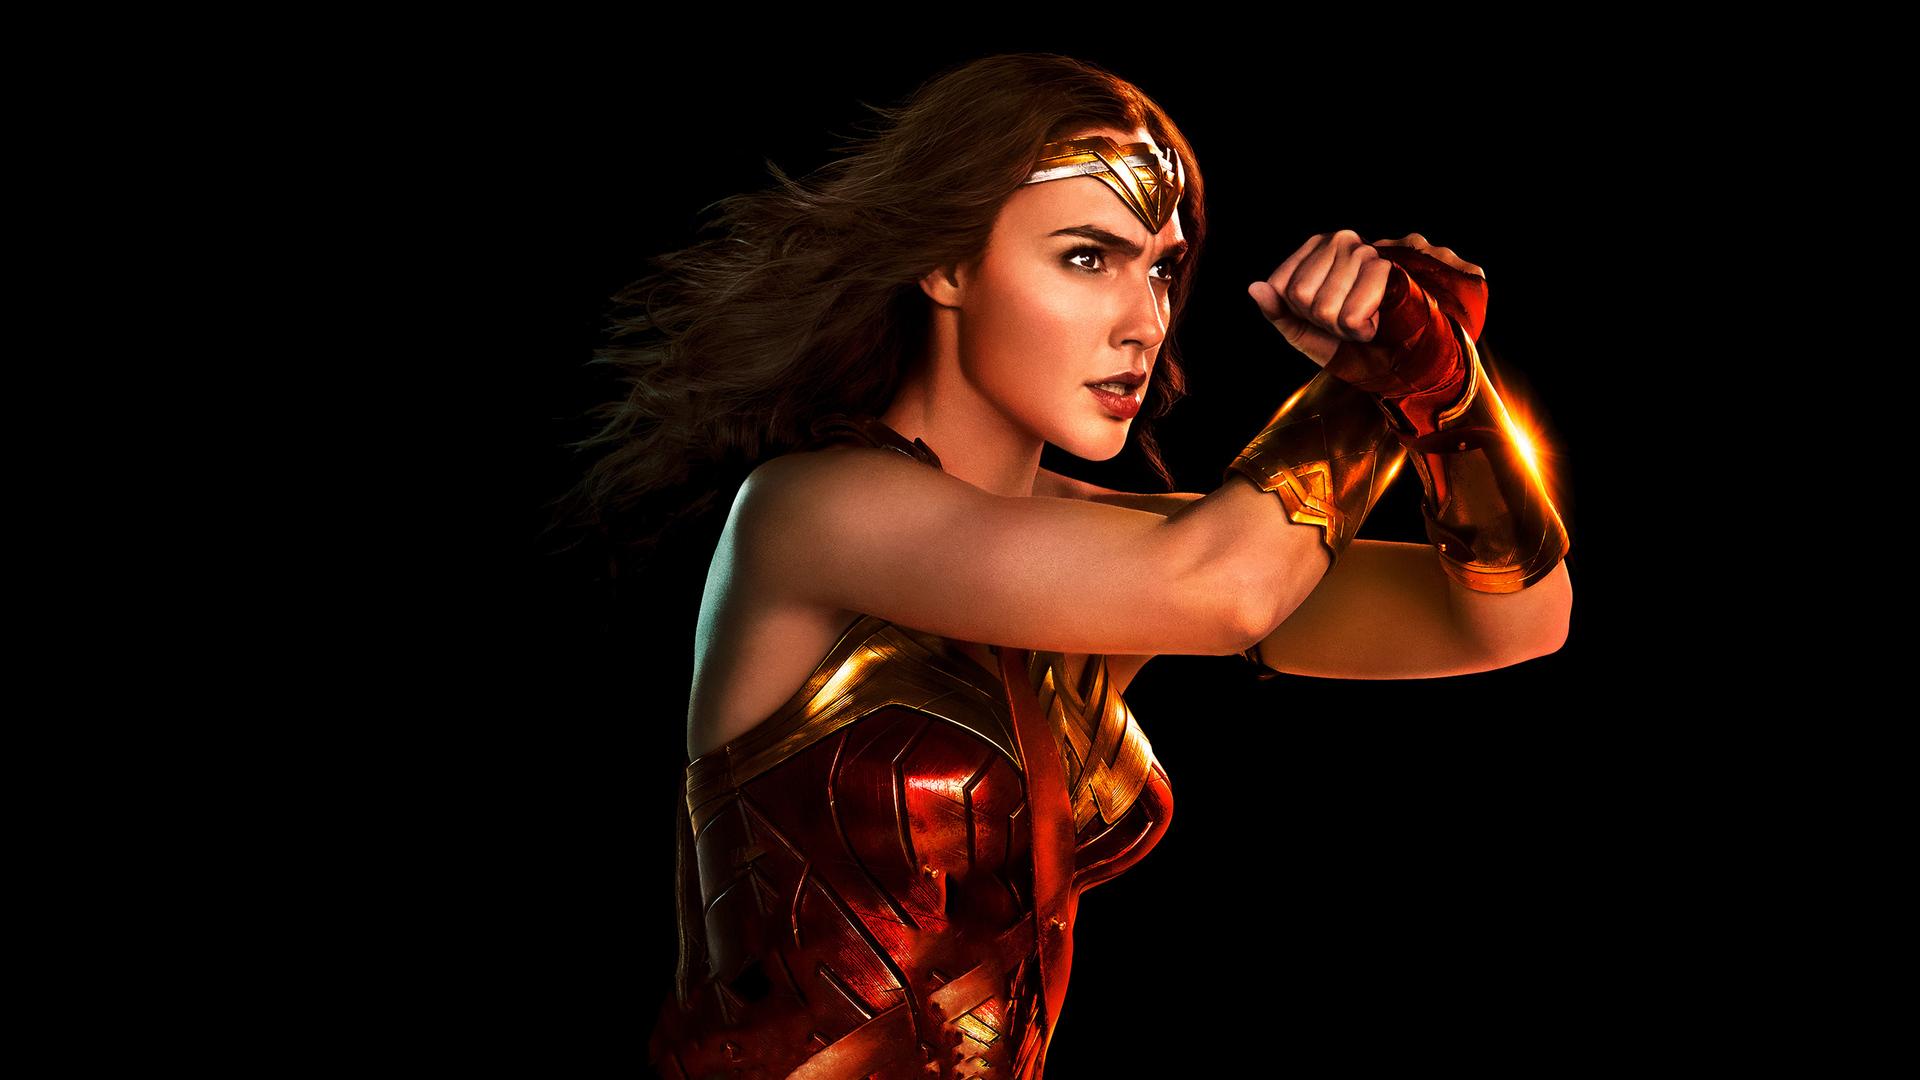 Wonder Woman 2017 Wallpaper Full Hd Free Download: 1920x1080 Wonder Woman Justice League 2017 4k Laptop Full